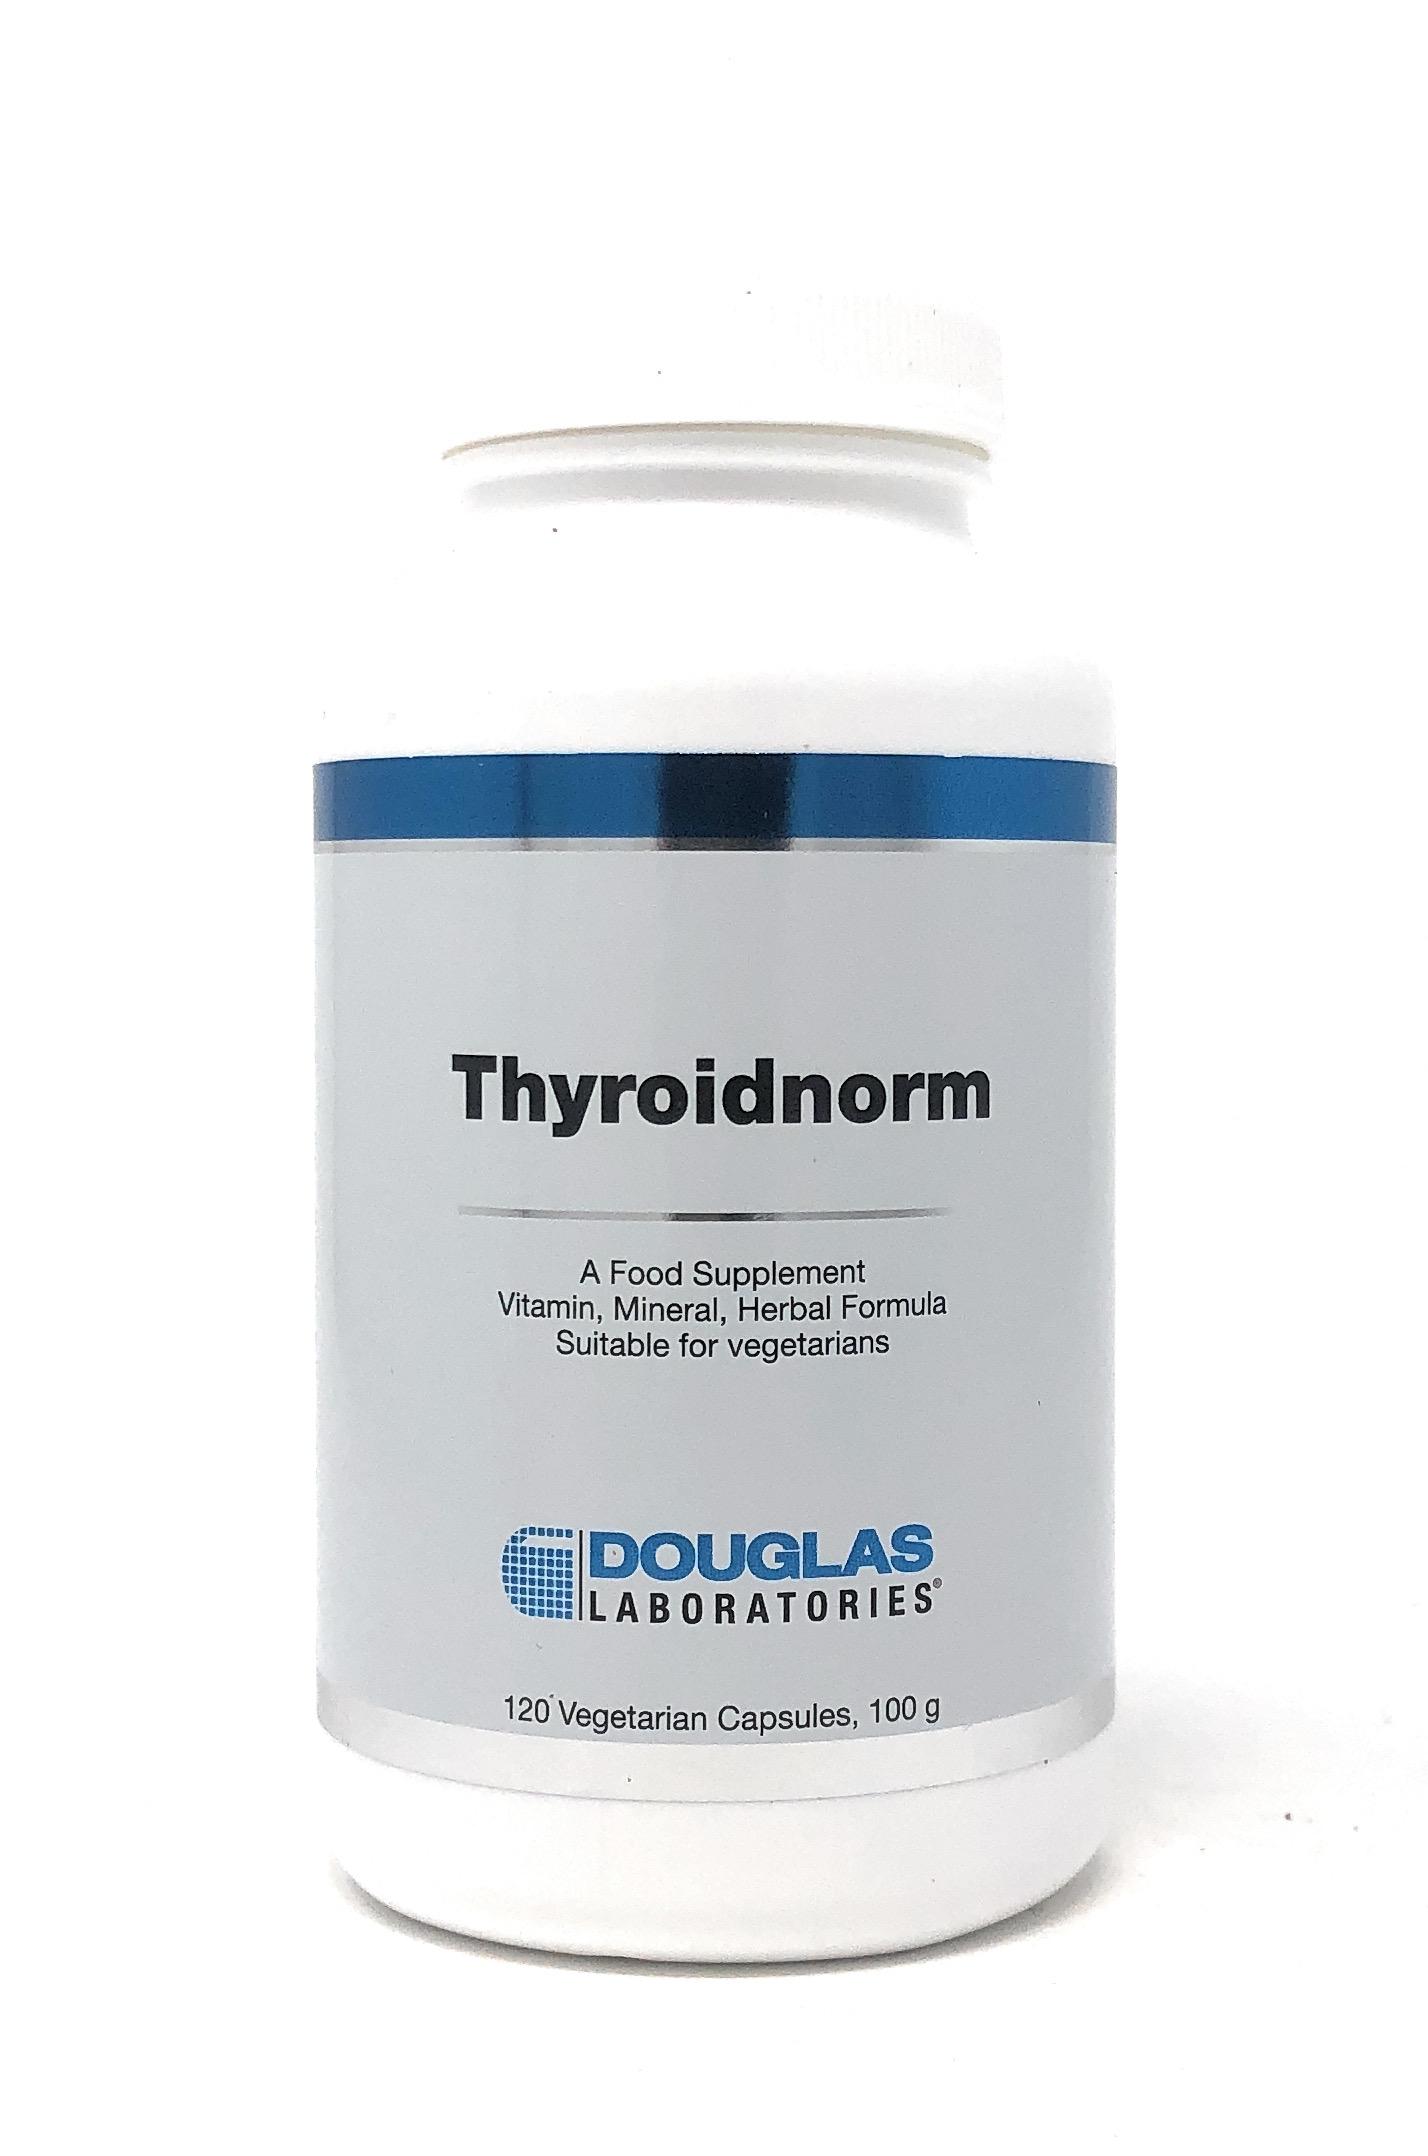 Douglas Laboratories Europe Thyroidnorm 120 veg. Kapseln (100g)